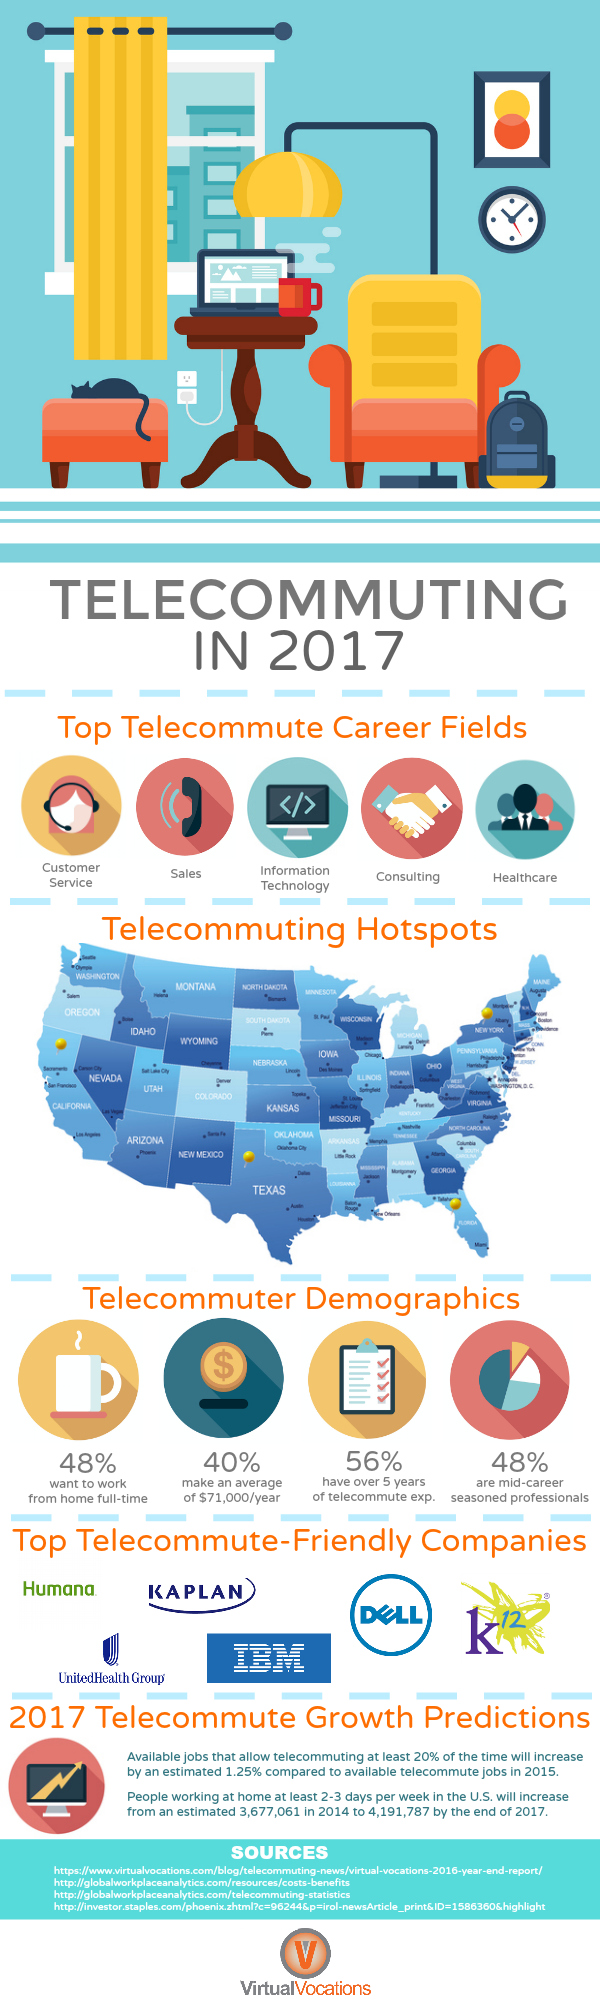 virtual vocations telecommute job board celebrates year anniversary